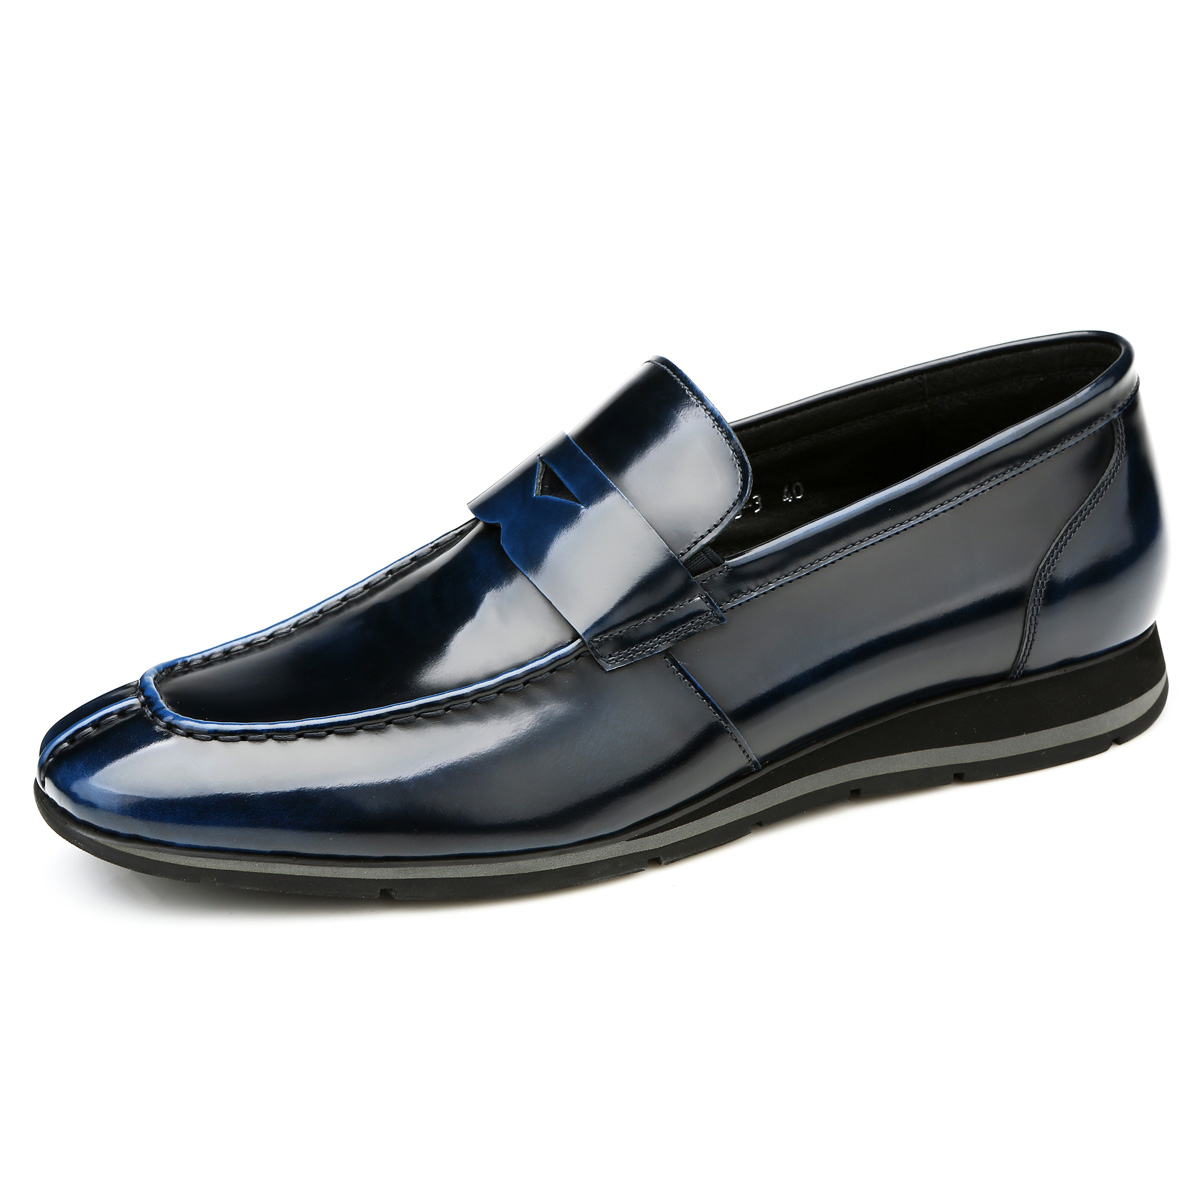 Giày da nam Olunpo QHT1431 ấn tượng